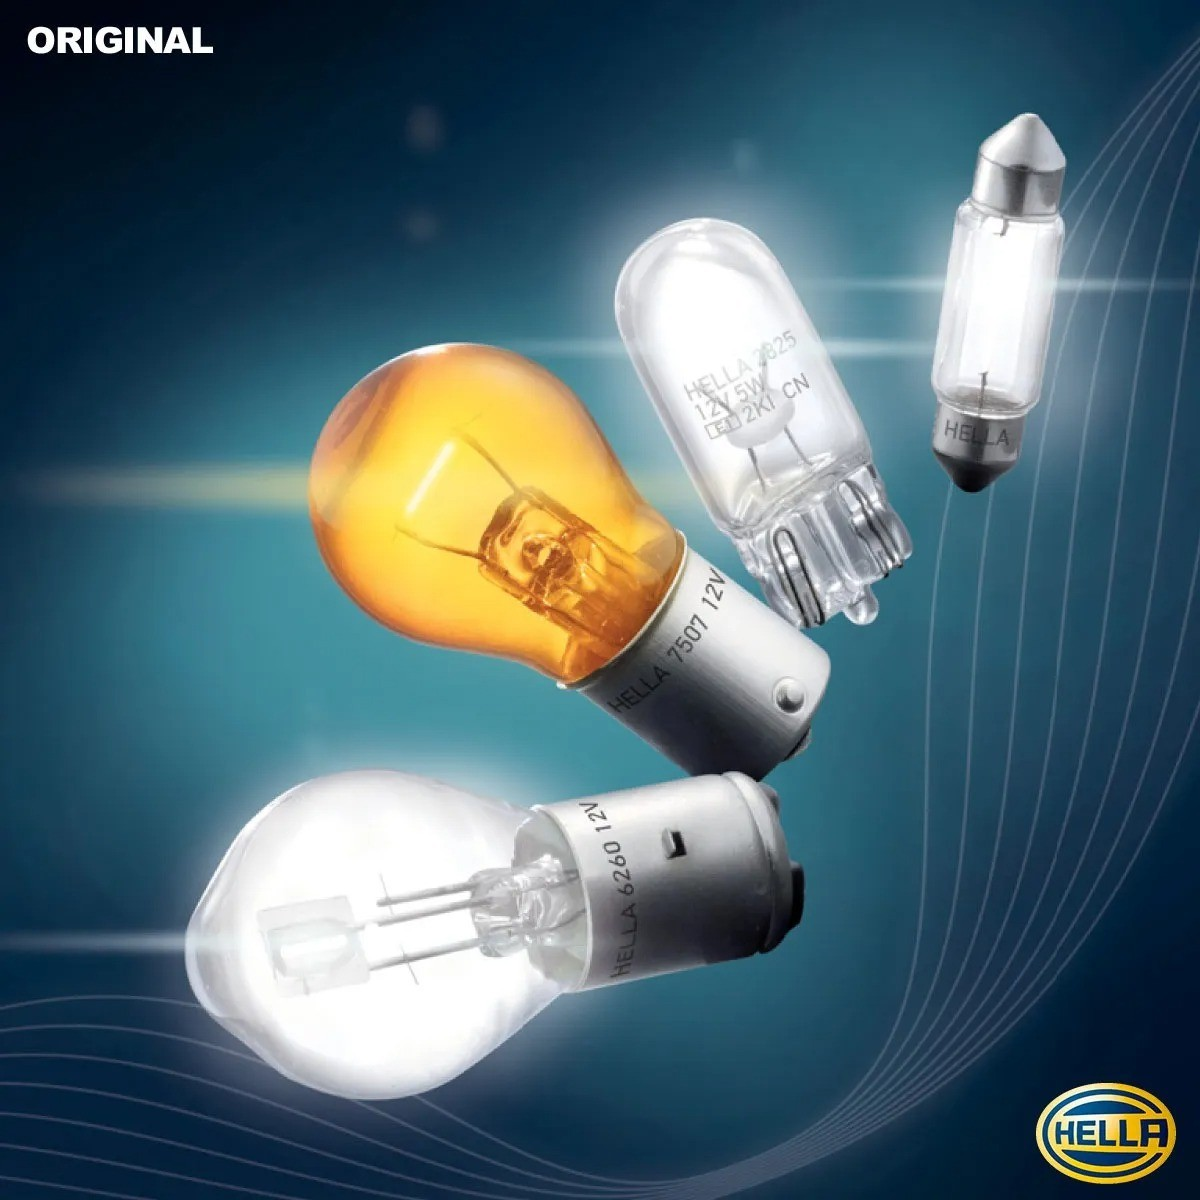 LAMPADA CONVENCIONAL  12V 65/45W FAROL HB1 UNIVERSAL HELLA